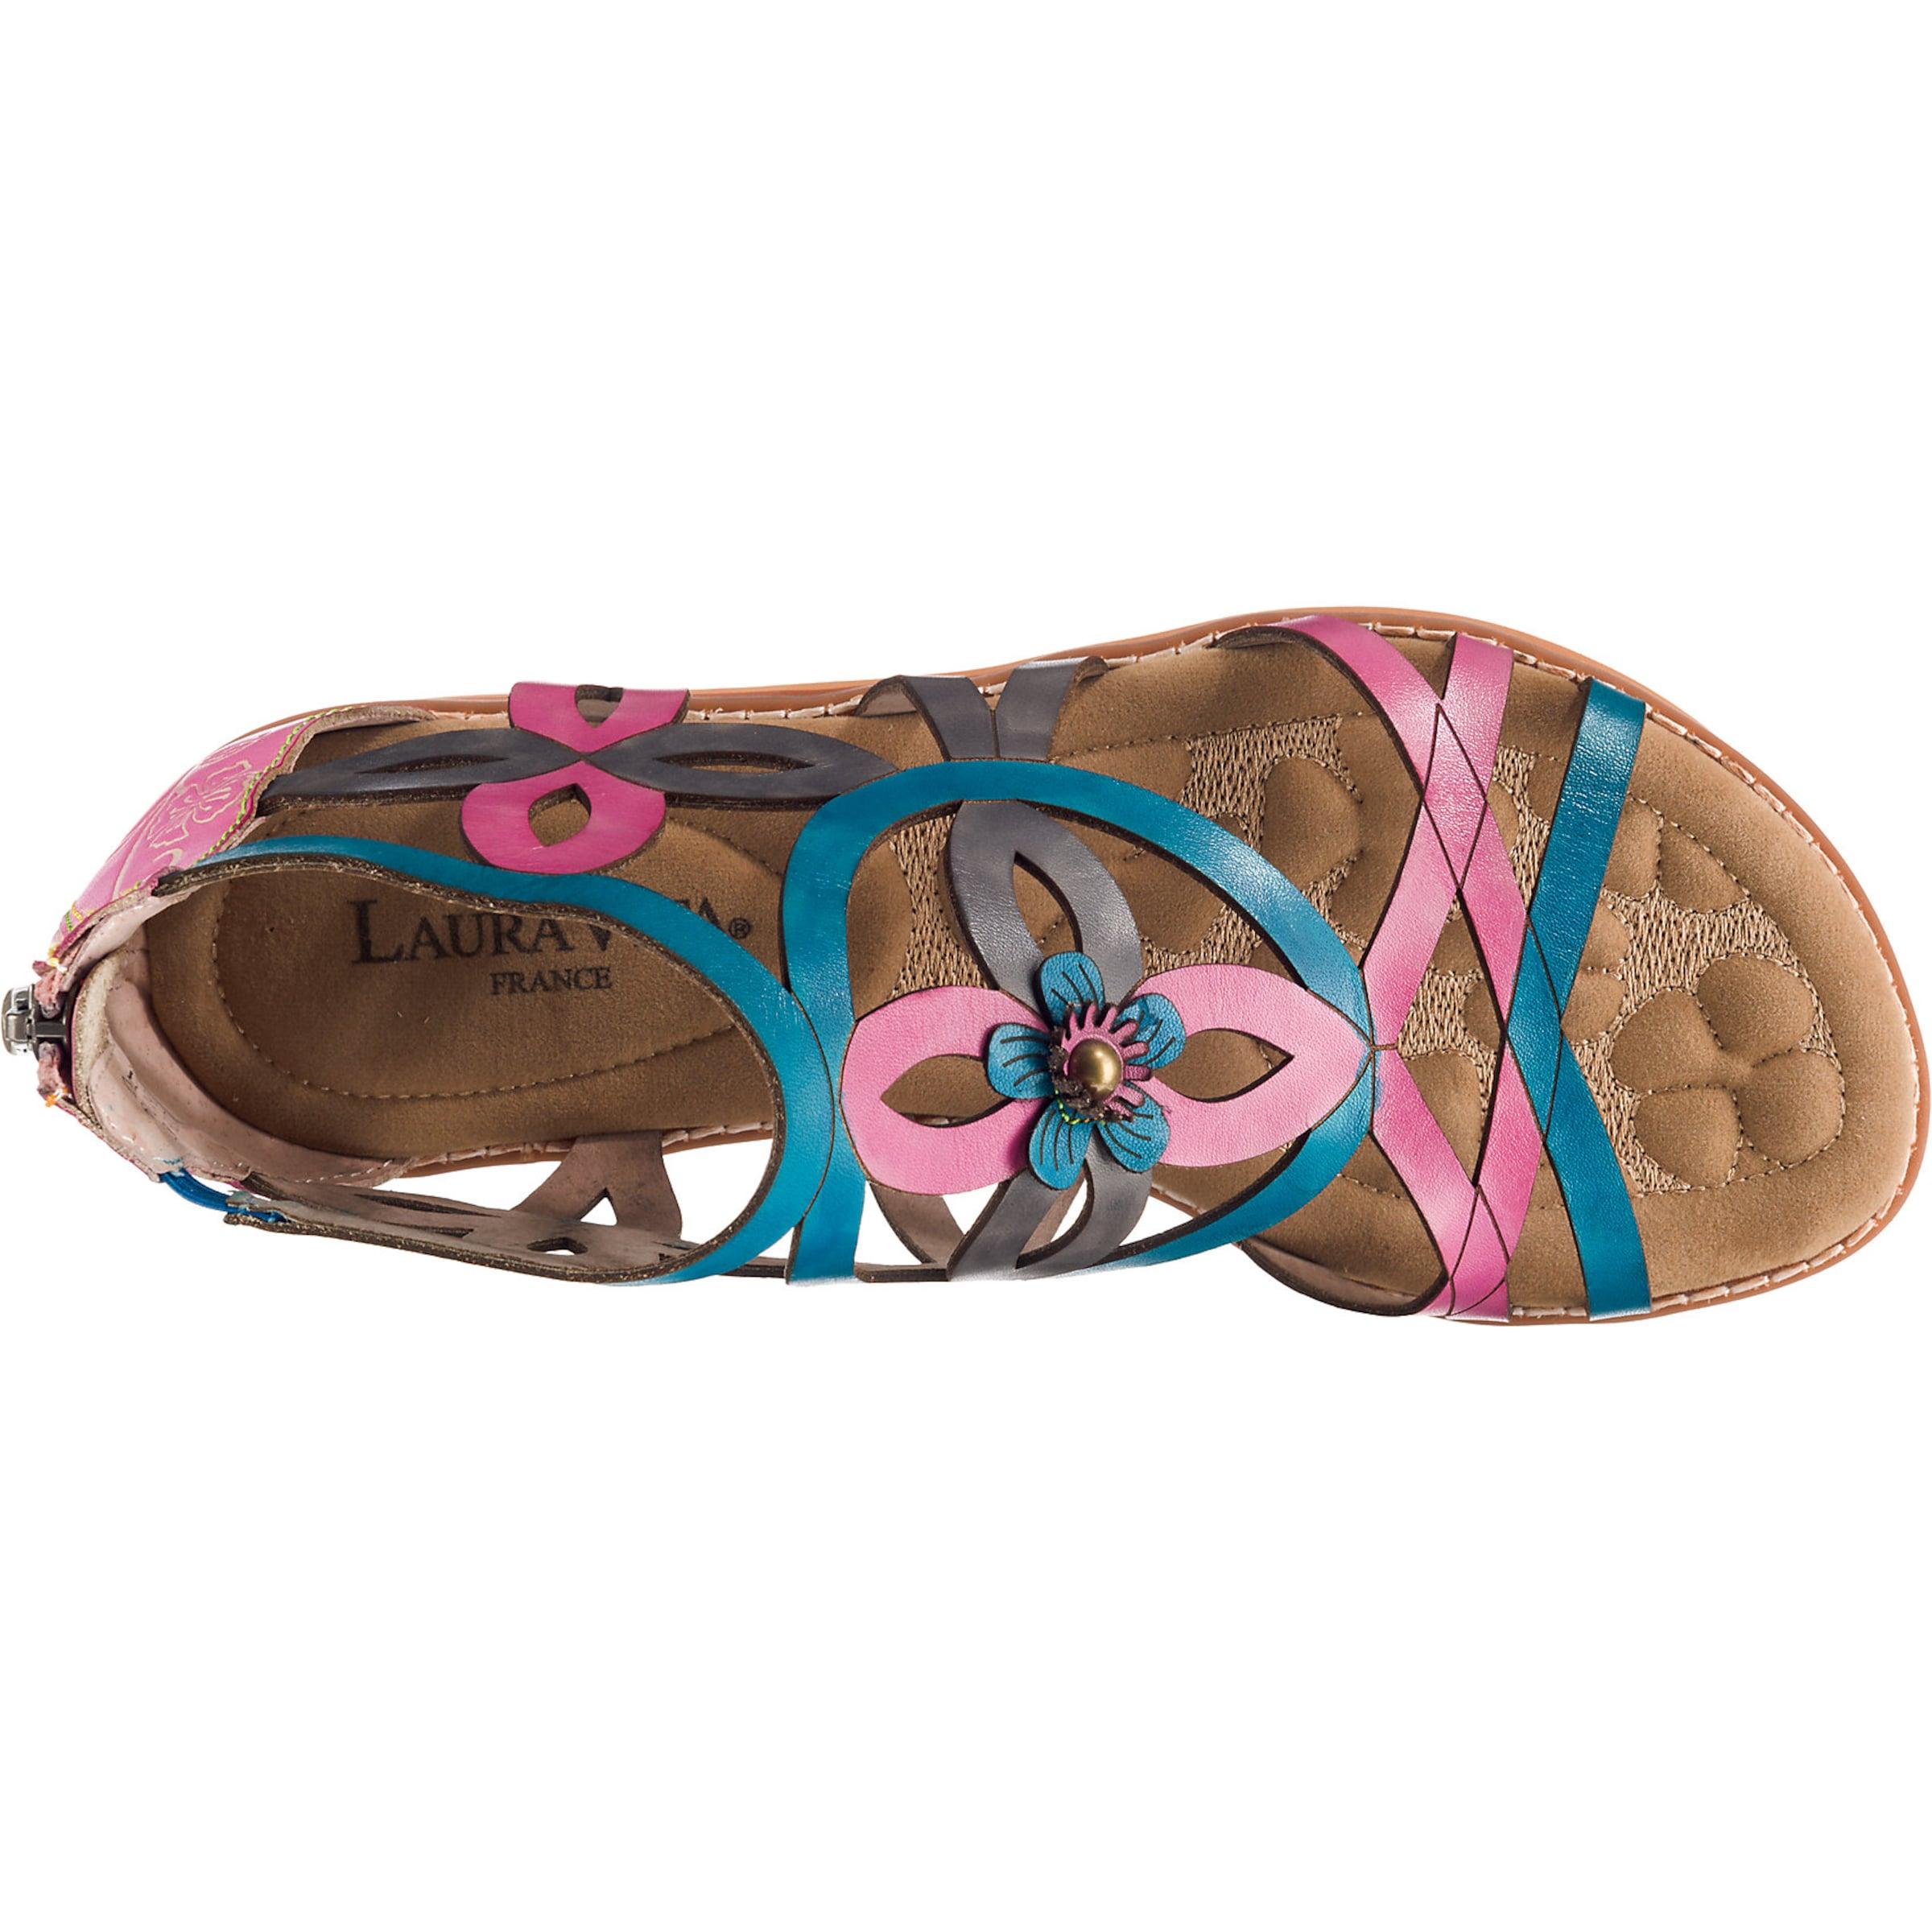 Vita Komfort Pink In Laura sandalen TürkisDunkelgrau tsxQrdChB